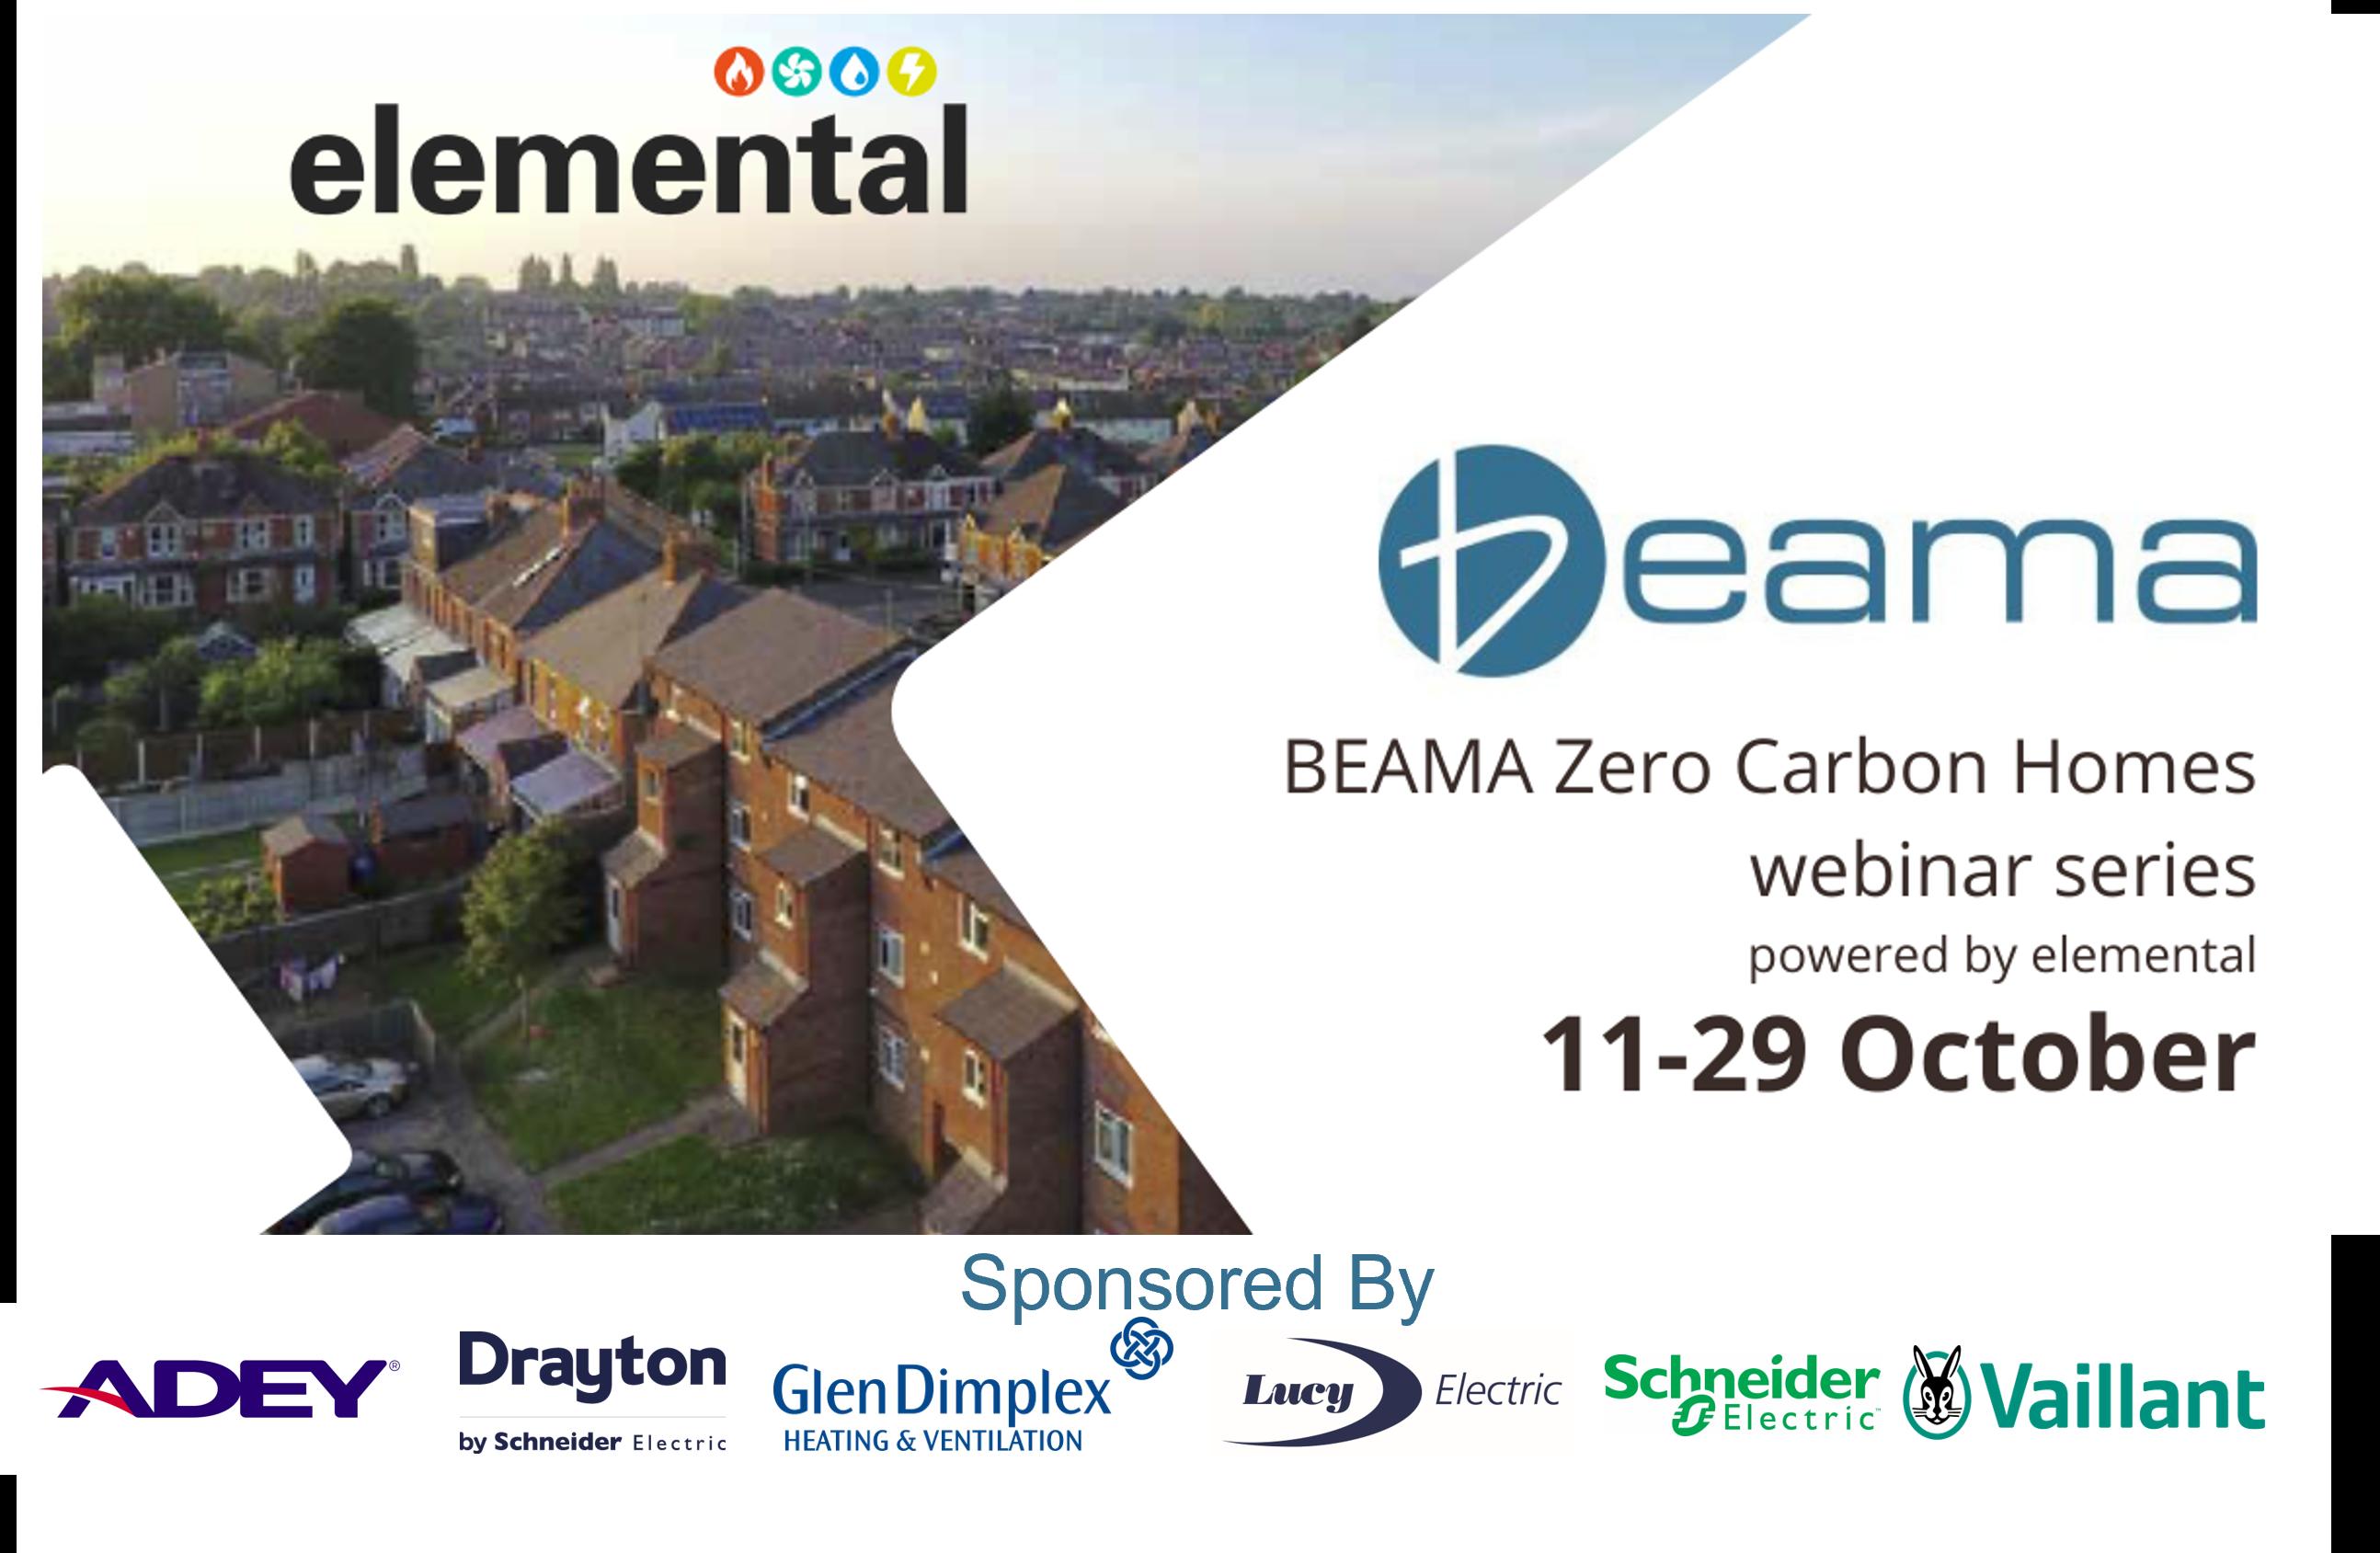 Drayton sponsors BEAMA Zero Carbon Homes Webinars 2021